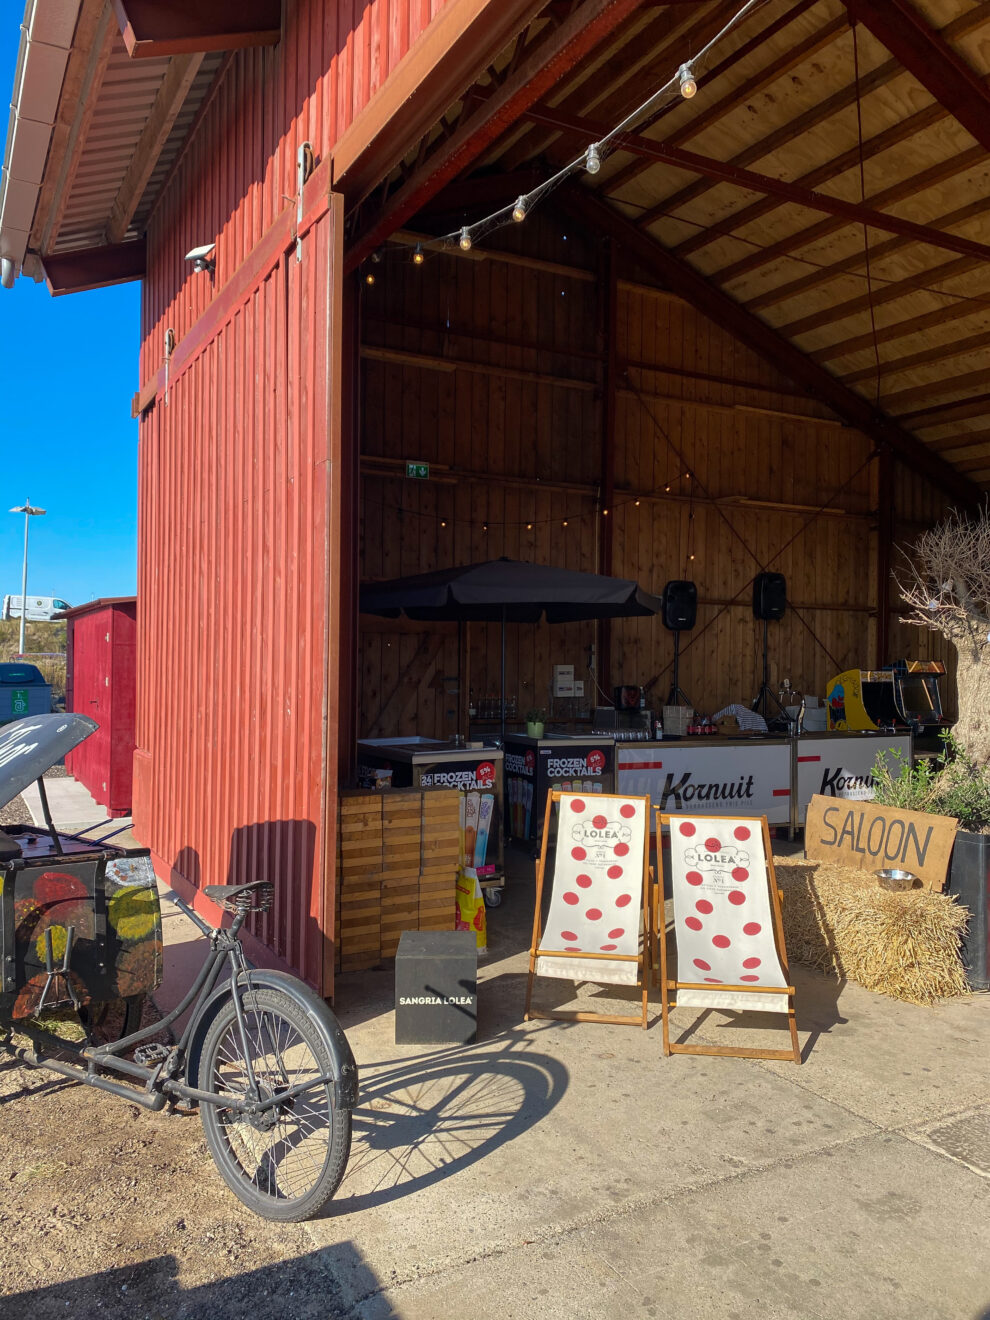 Basecamp IJmuiden, tiny houses digital nomad rauwe duinen